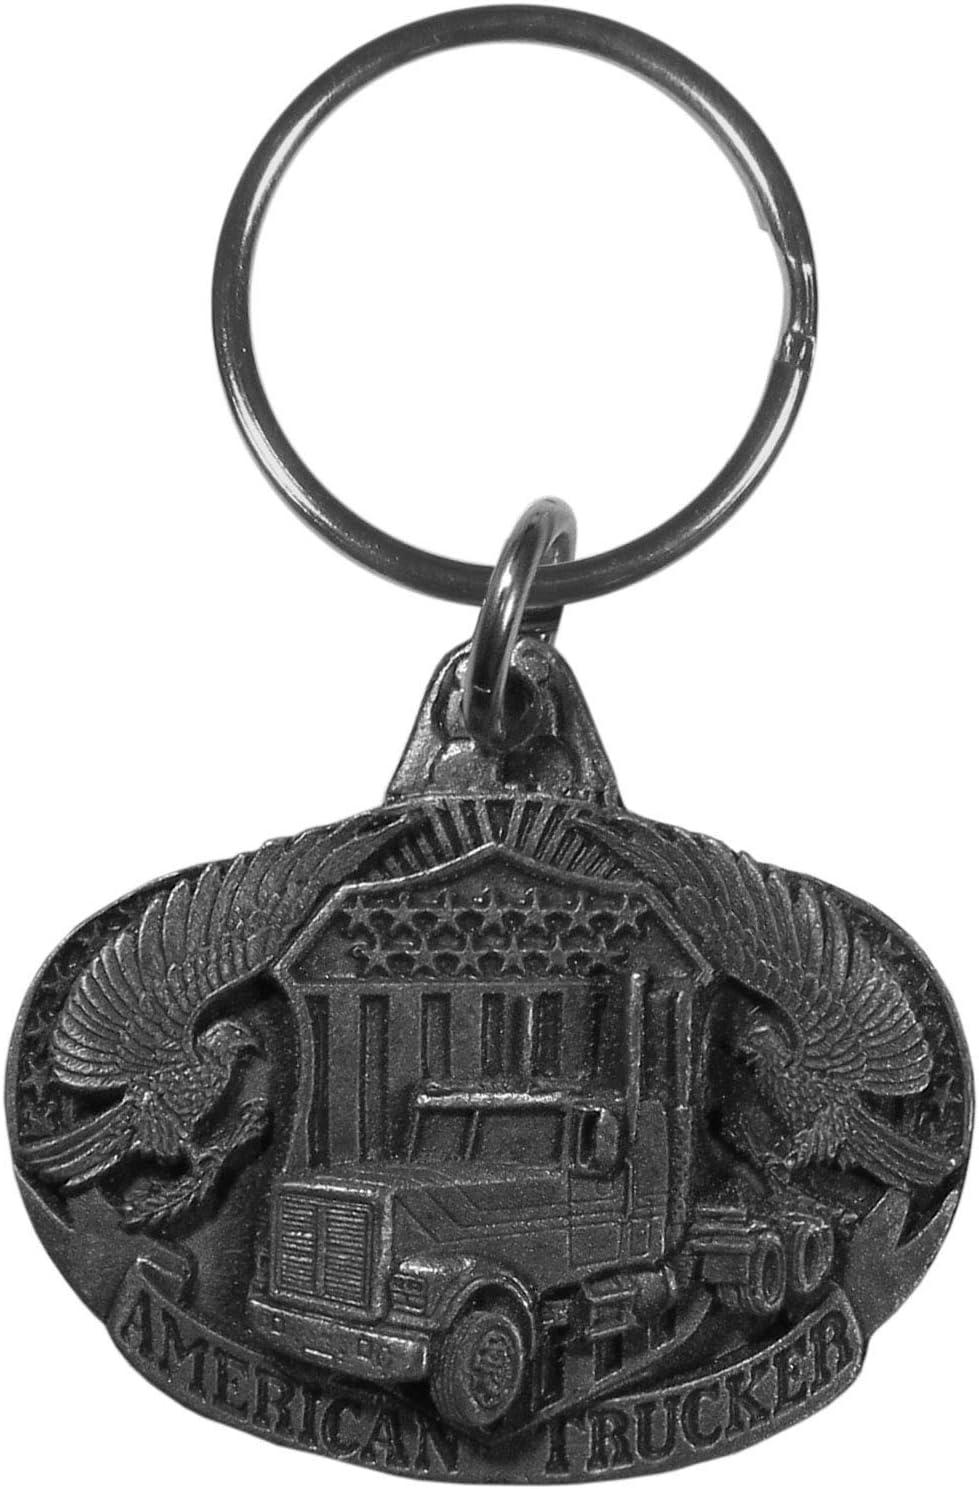 Siskiyou Free Form Eagles Head Antiqued Key Chain